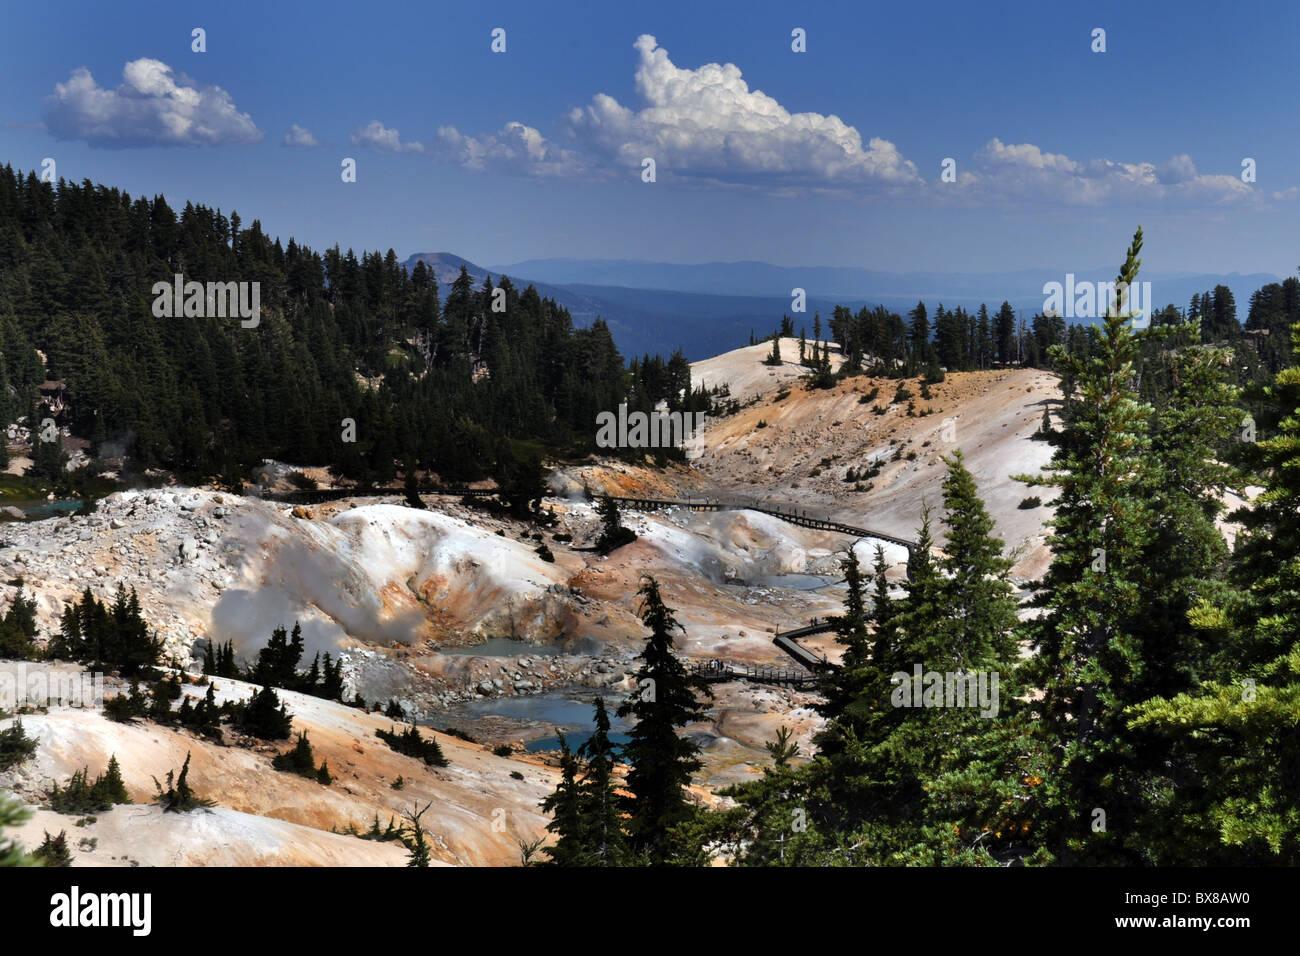 Lassen Volcanic  National Park, California USA - Stock Image